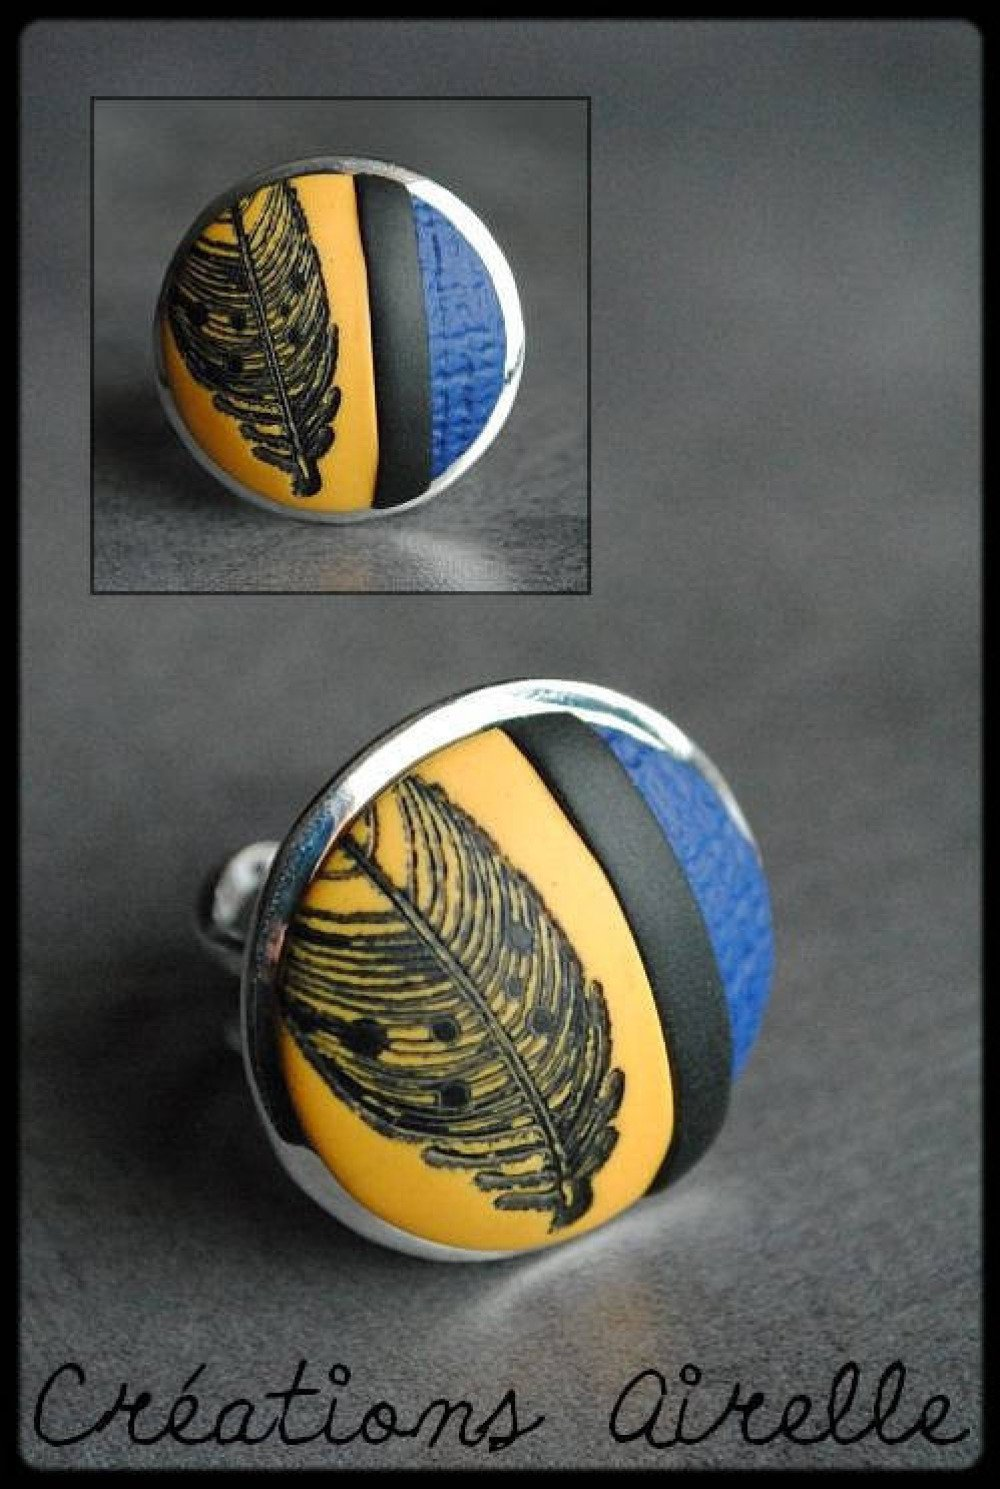 Bague ronde jaune / bleu motif plume en polymère